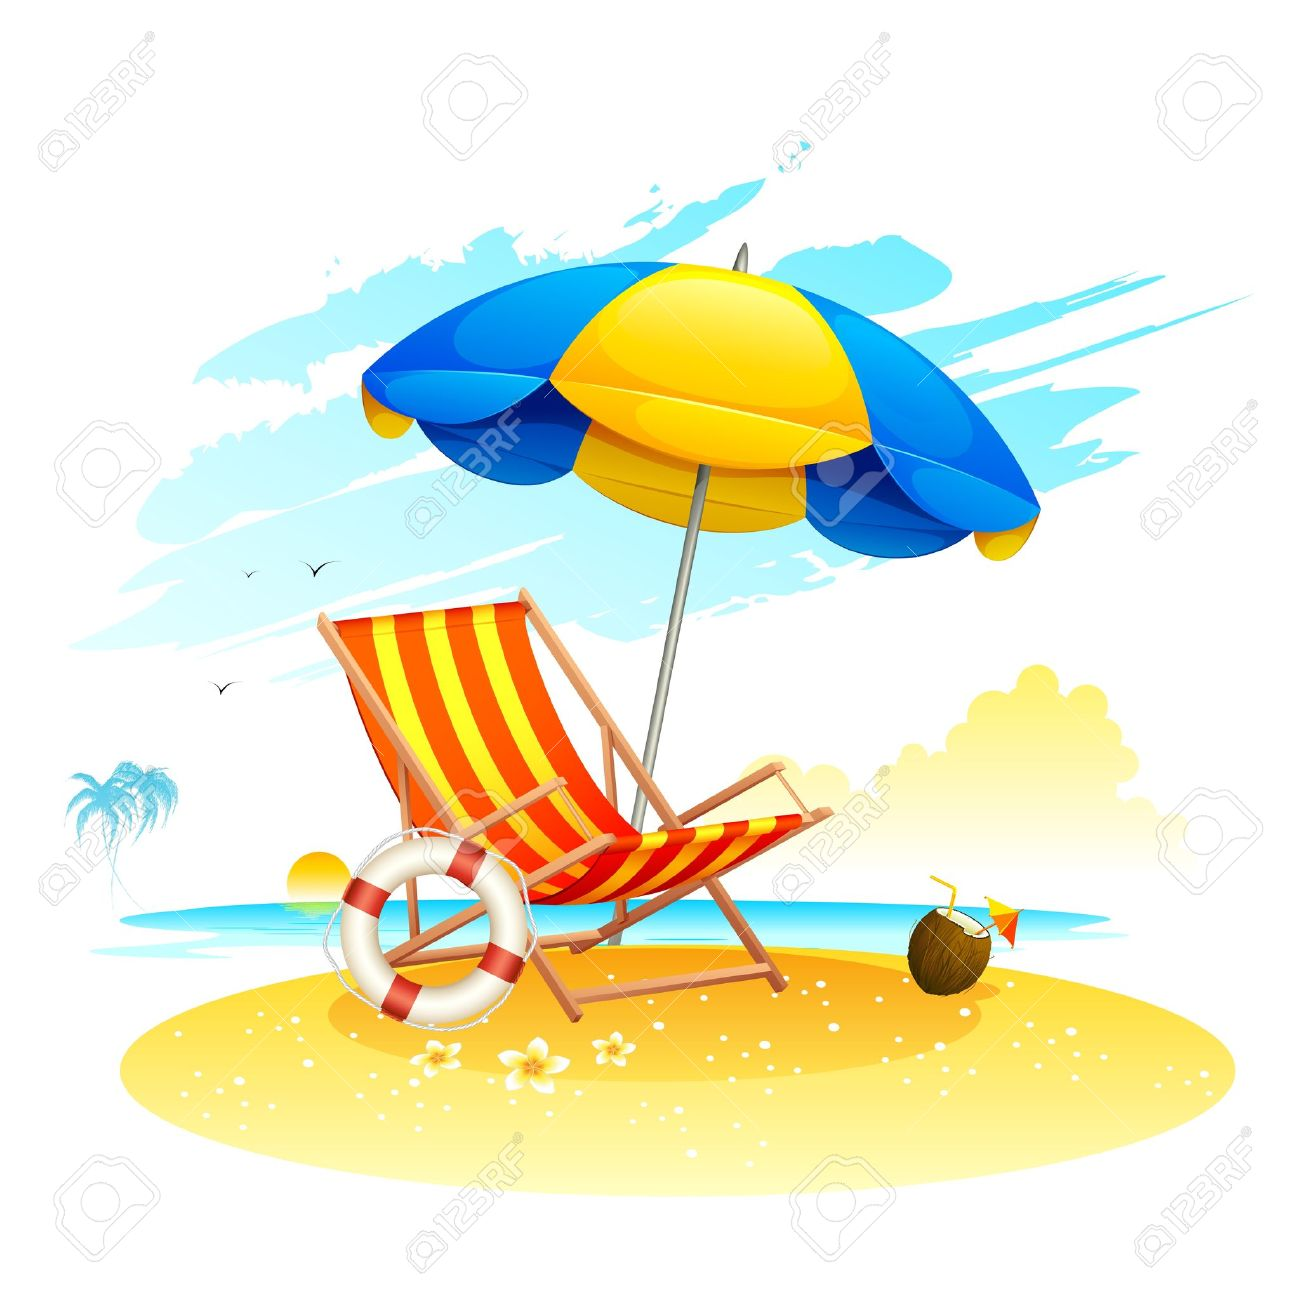 Beach chair with umbrella painting - Beach Chairs Illustration Of Recliner Under Garden Umbrella In Sea Beach